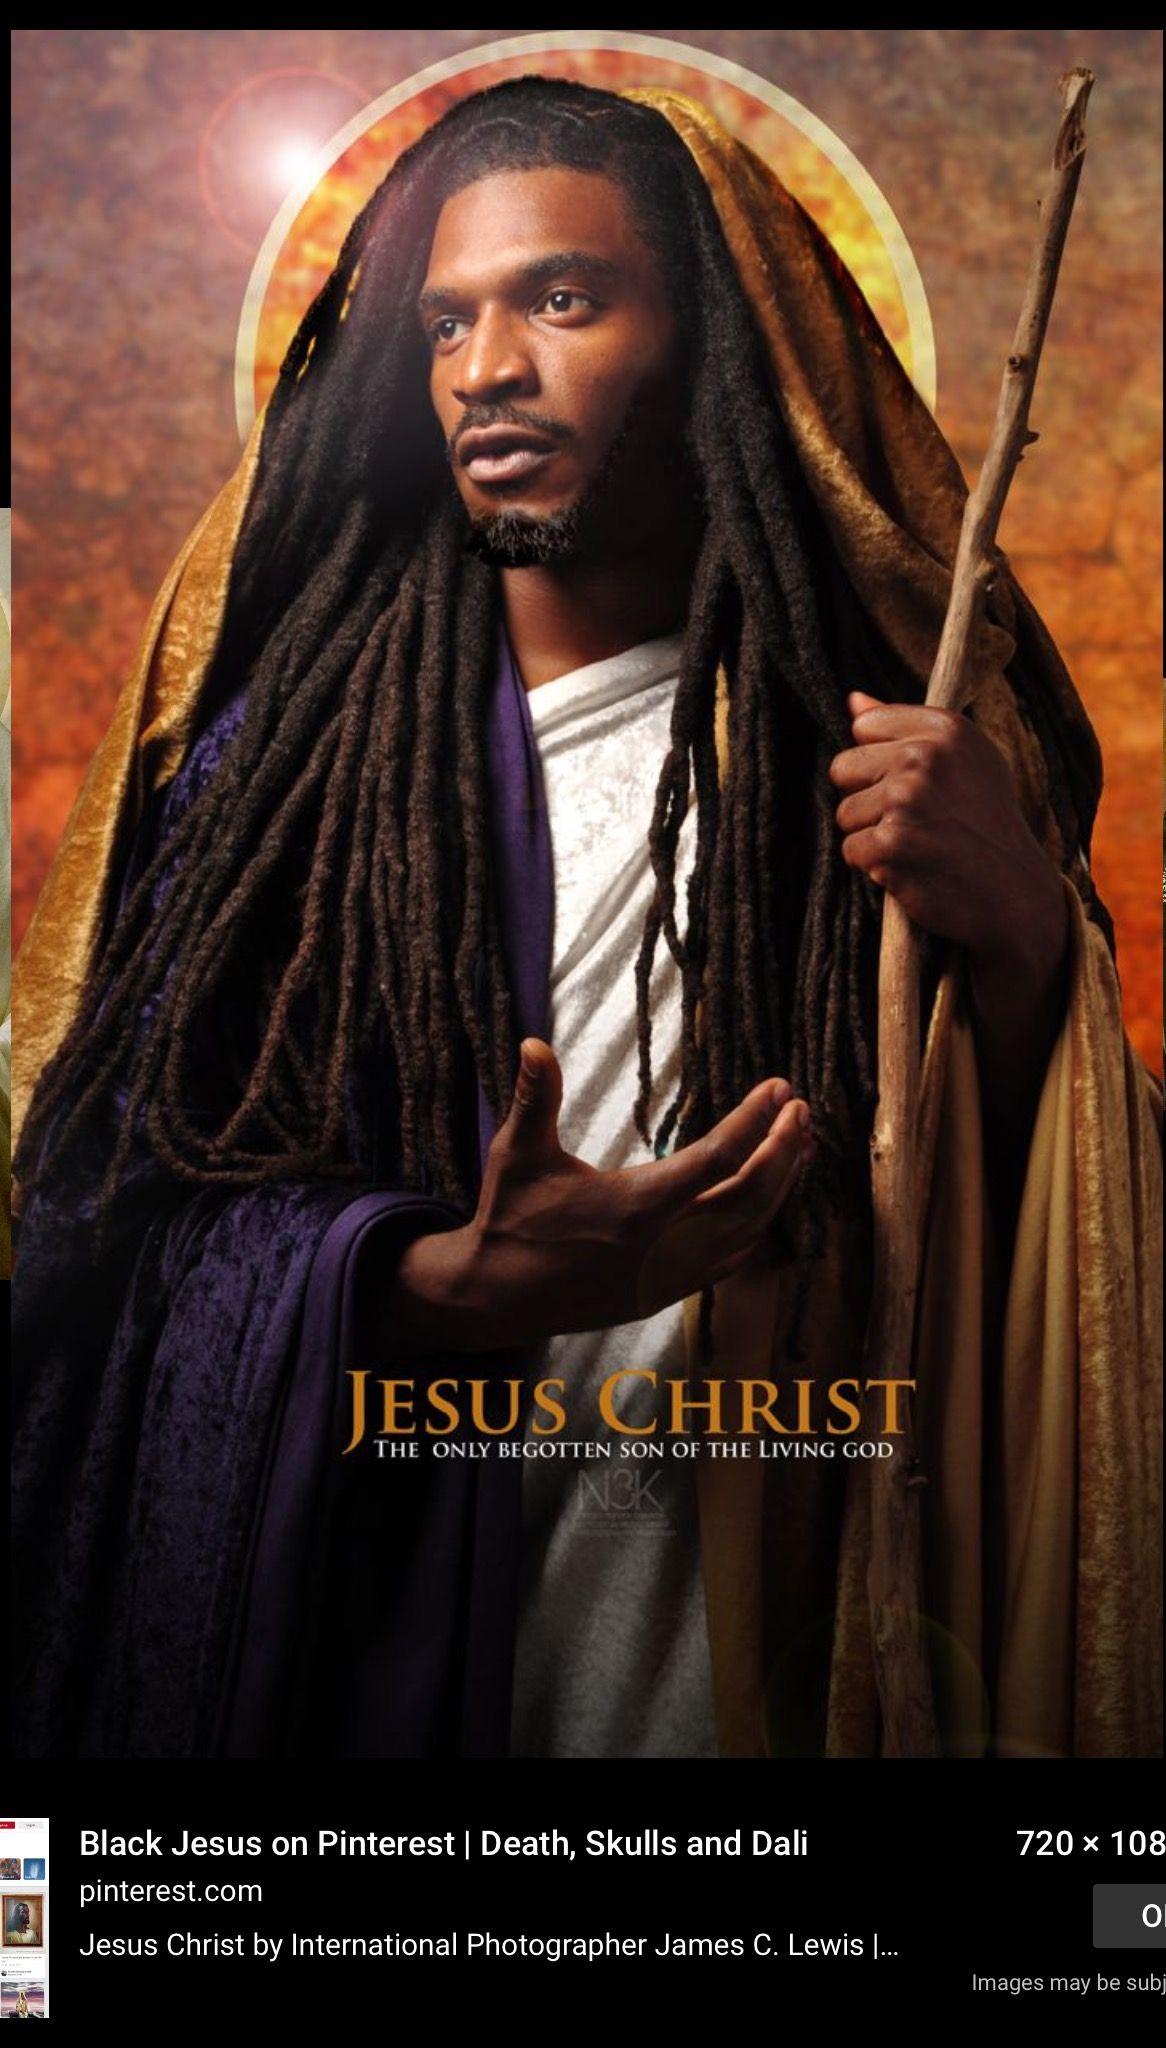 Pin By Darlene Twymon On Passion Of Christ Black Jesus Black